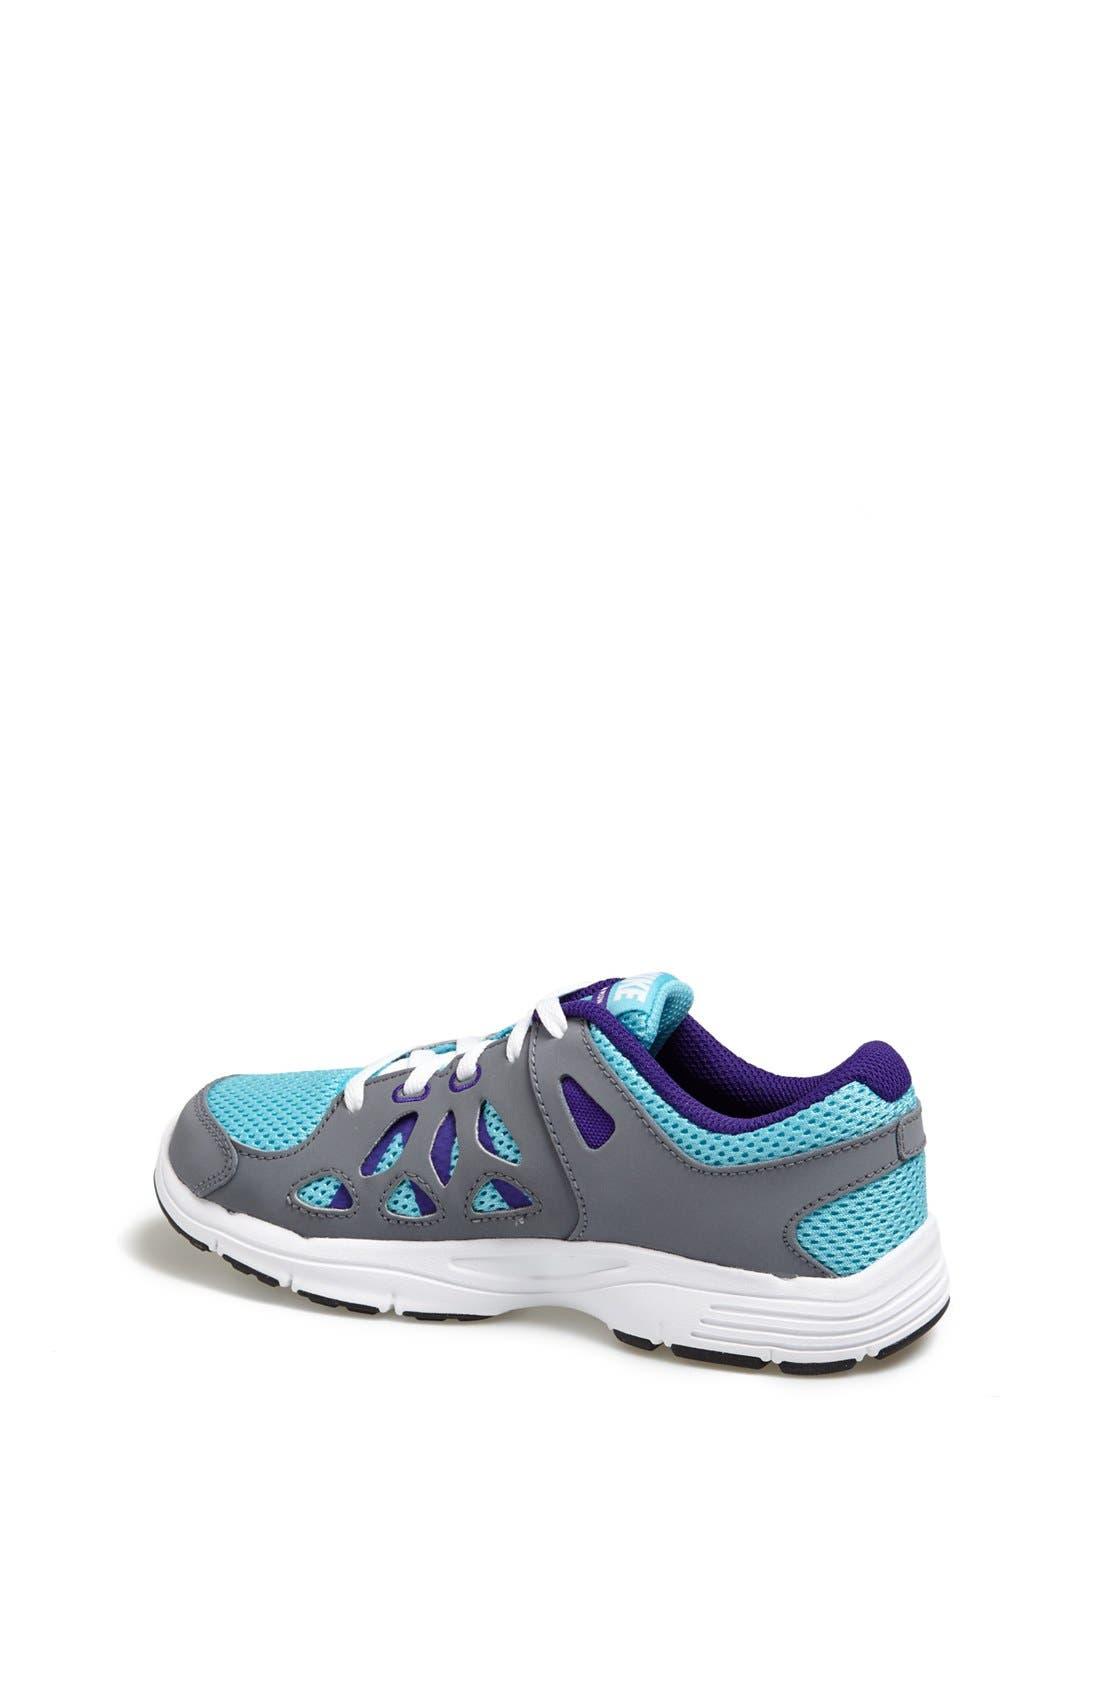 Alternate Image 2  - Nike 'Fusion Run' Athletic Shoe (Toddler & Little Kid)